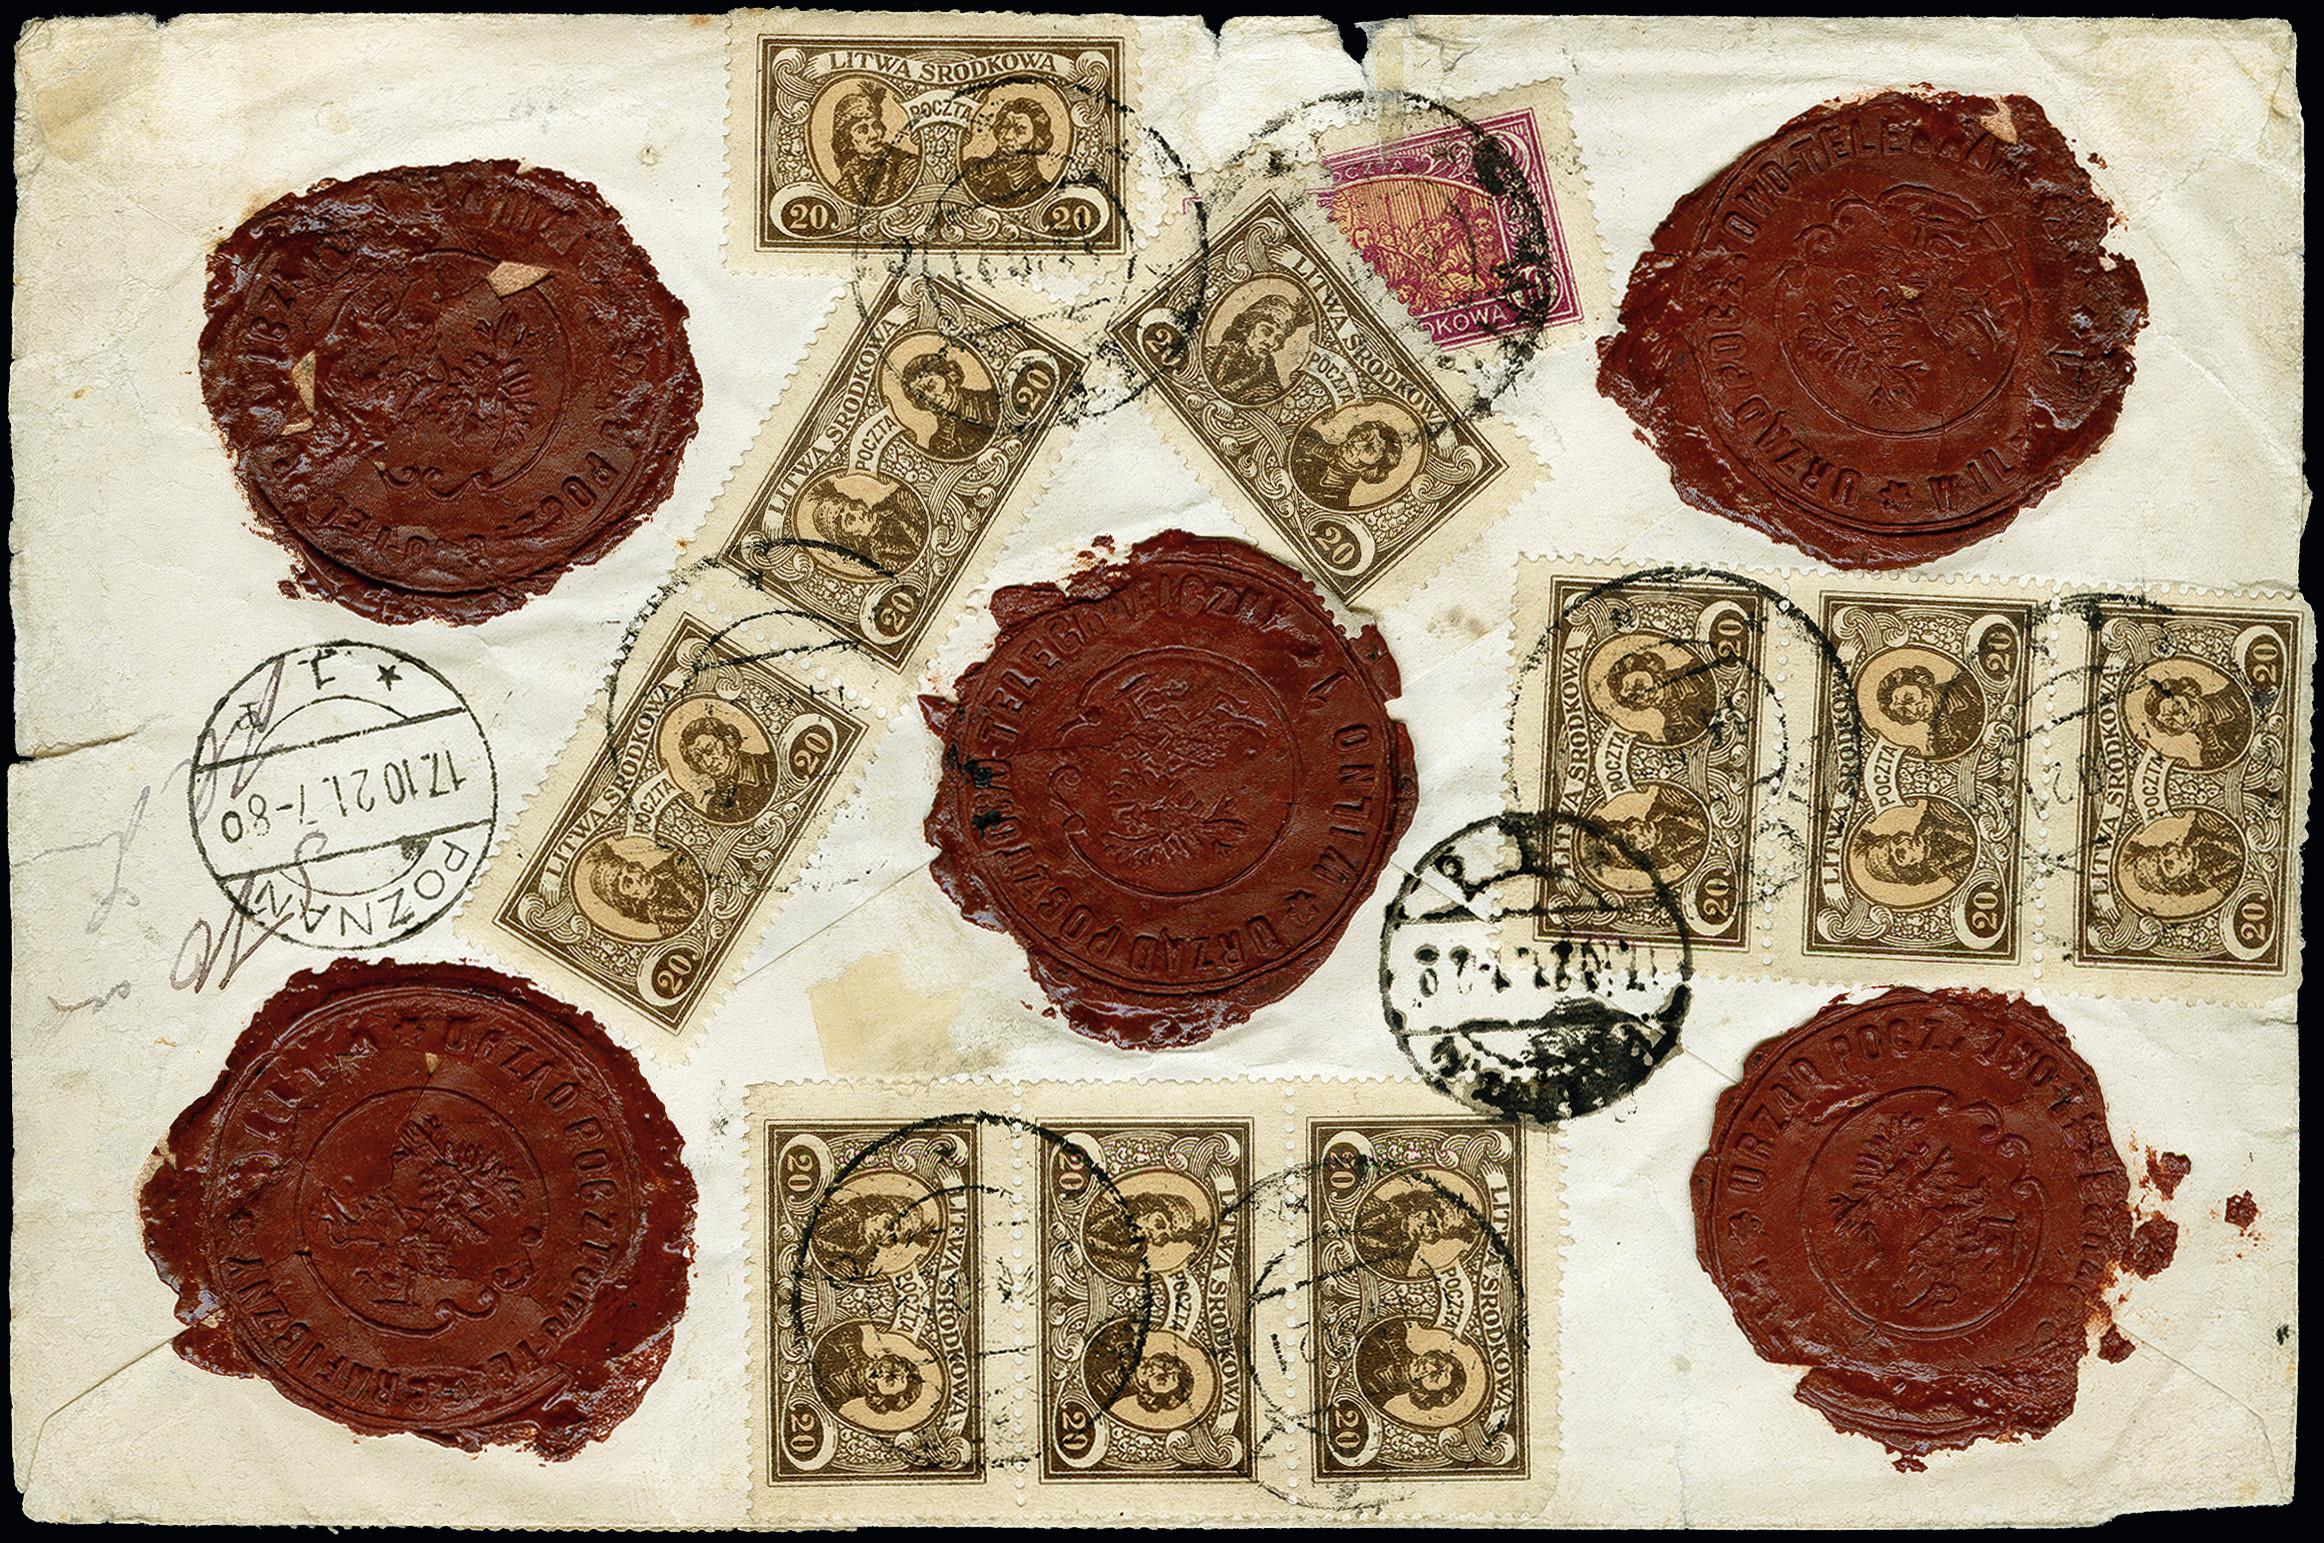 Lot 181 - europe central lithuania -  Heinrich Koehler Auktionen 373rd Heinrich Köhler auction - Day 1